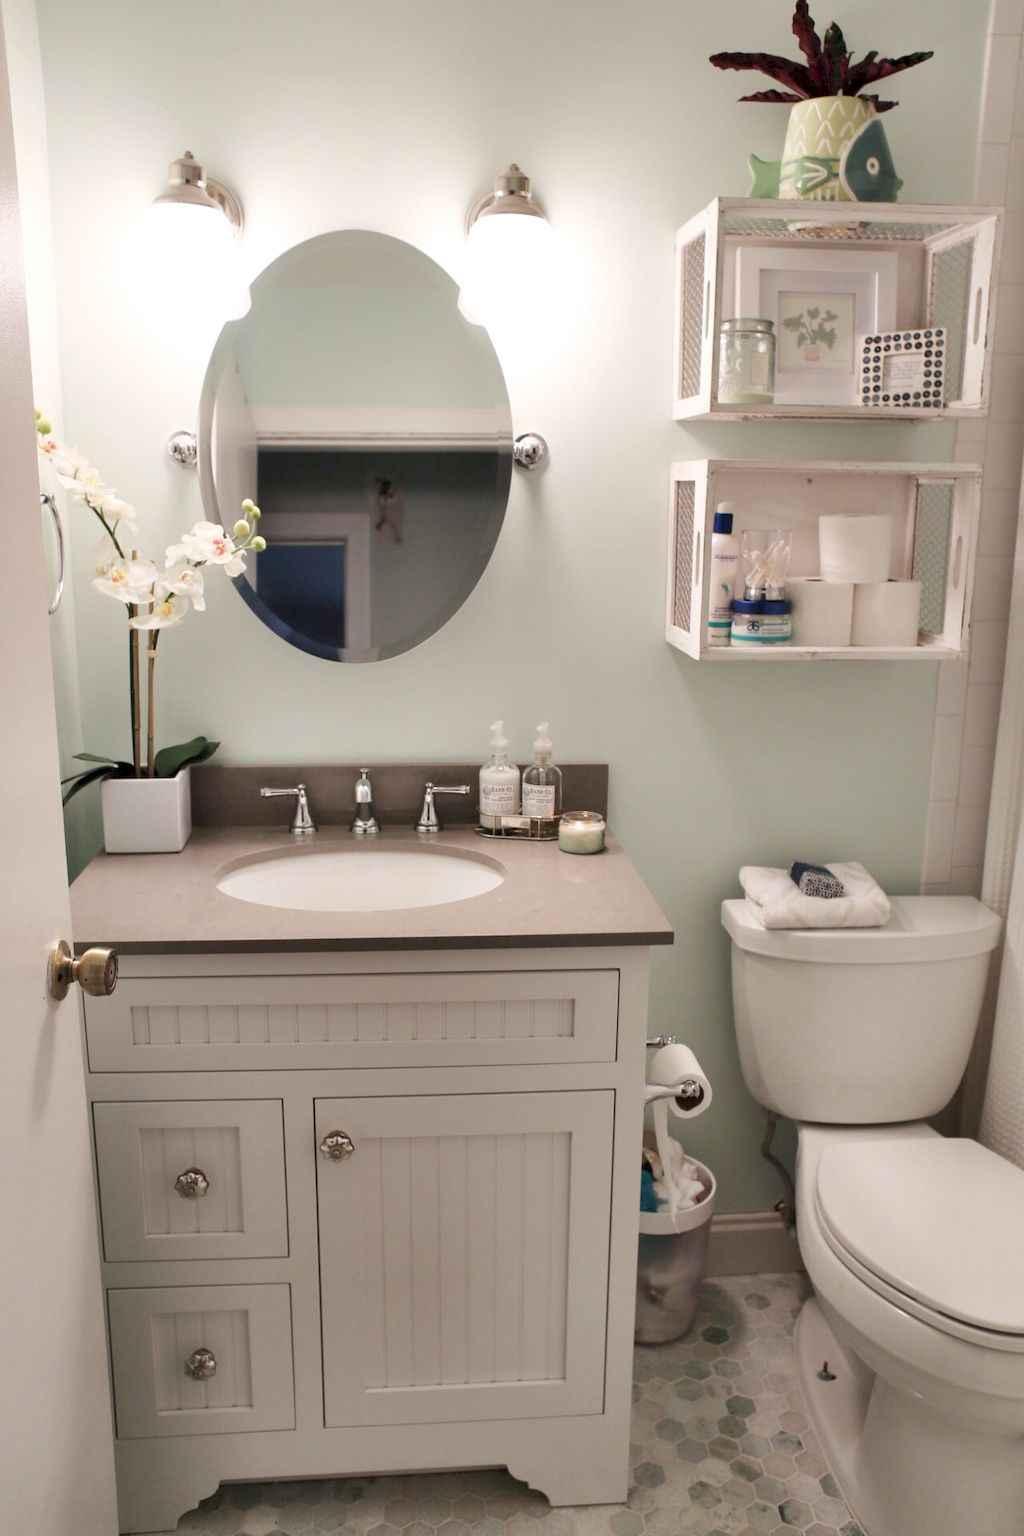 Inspiring apartment bathroom remodel ideas on a budget (22)